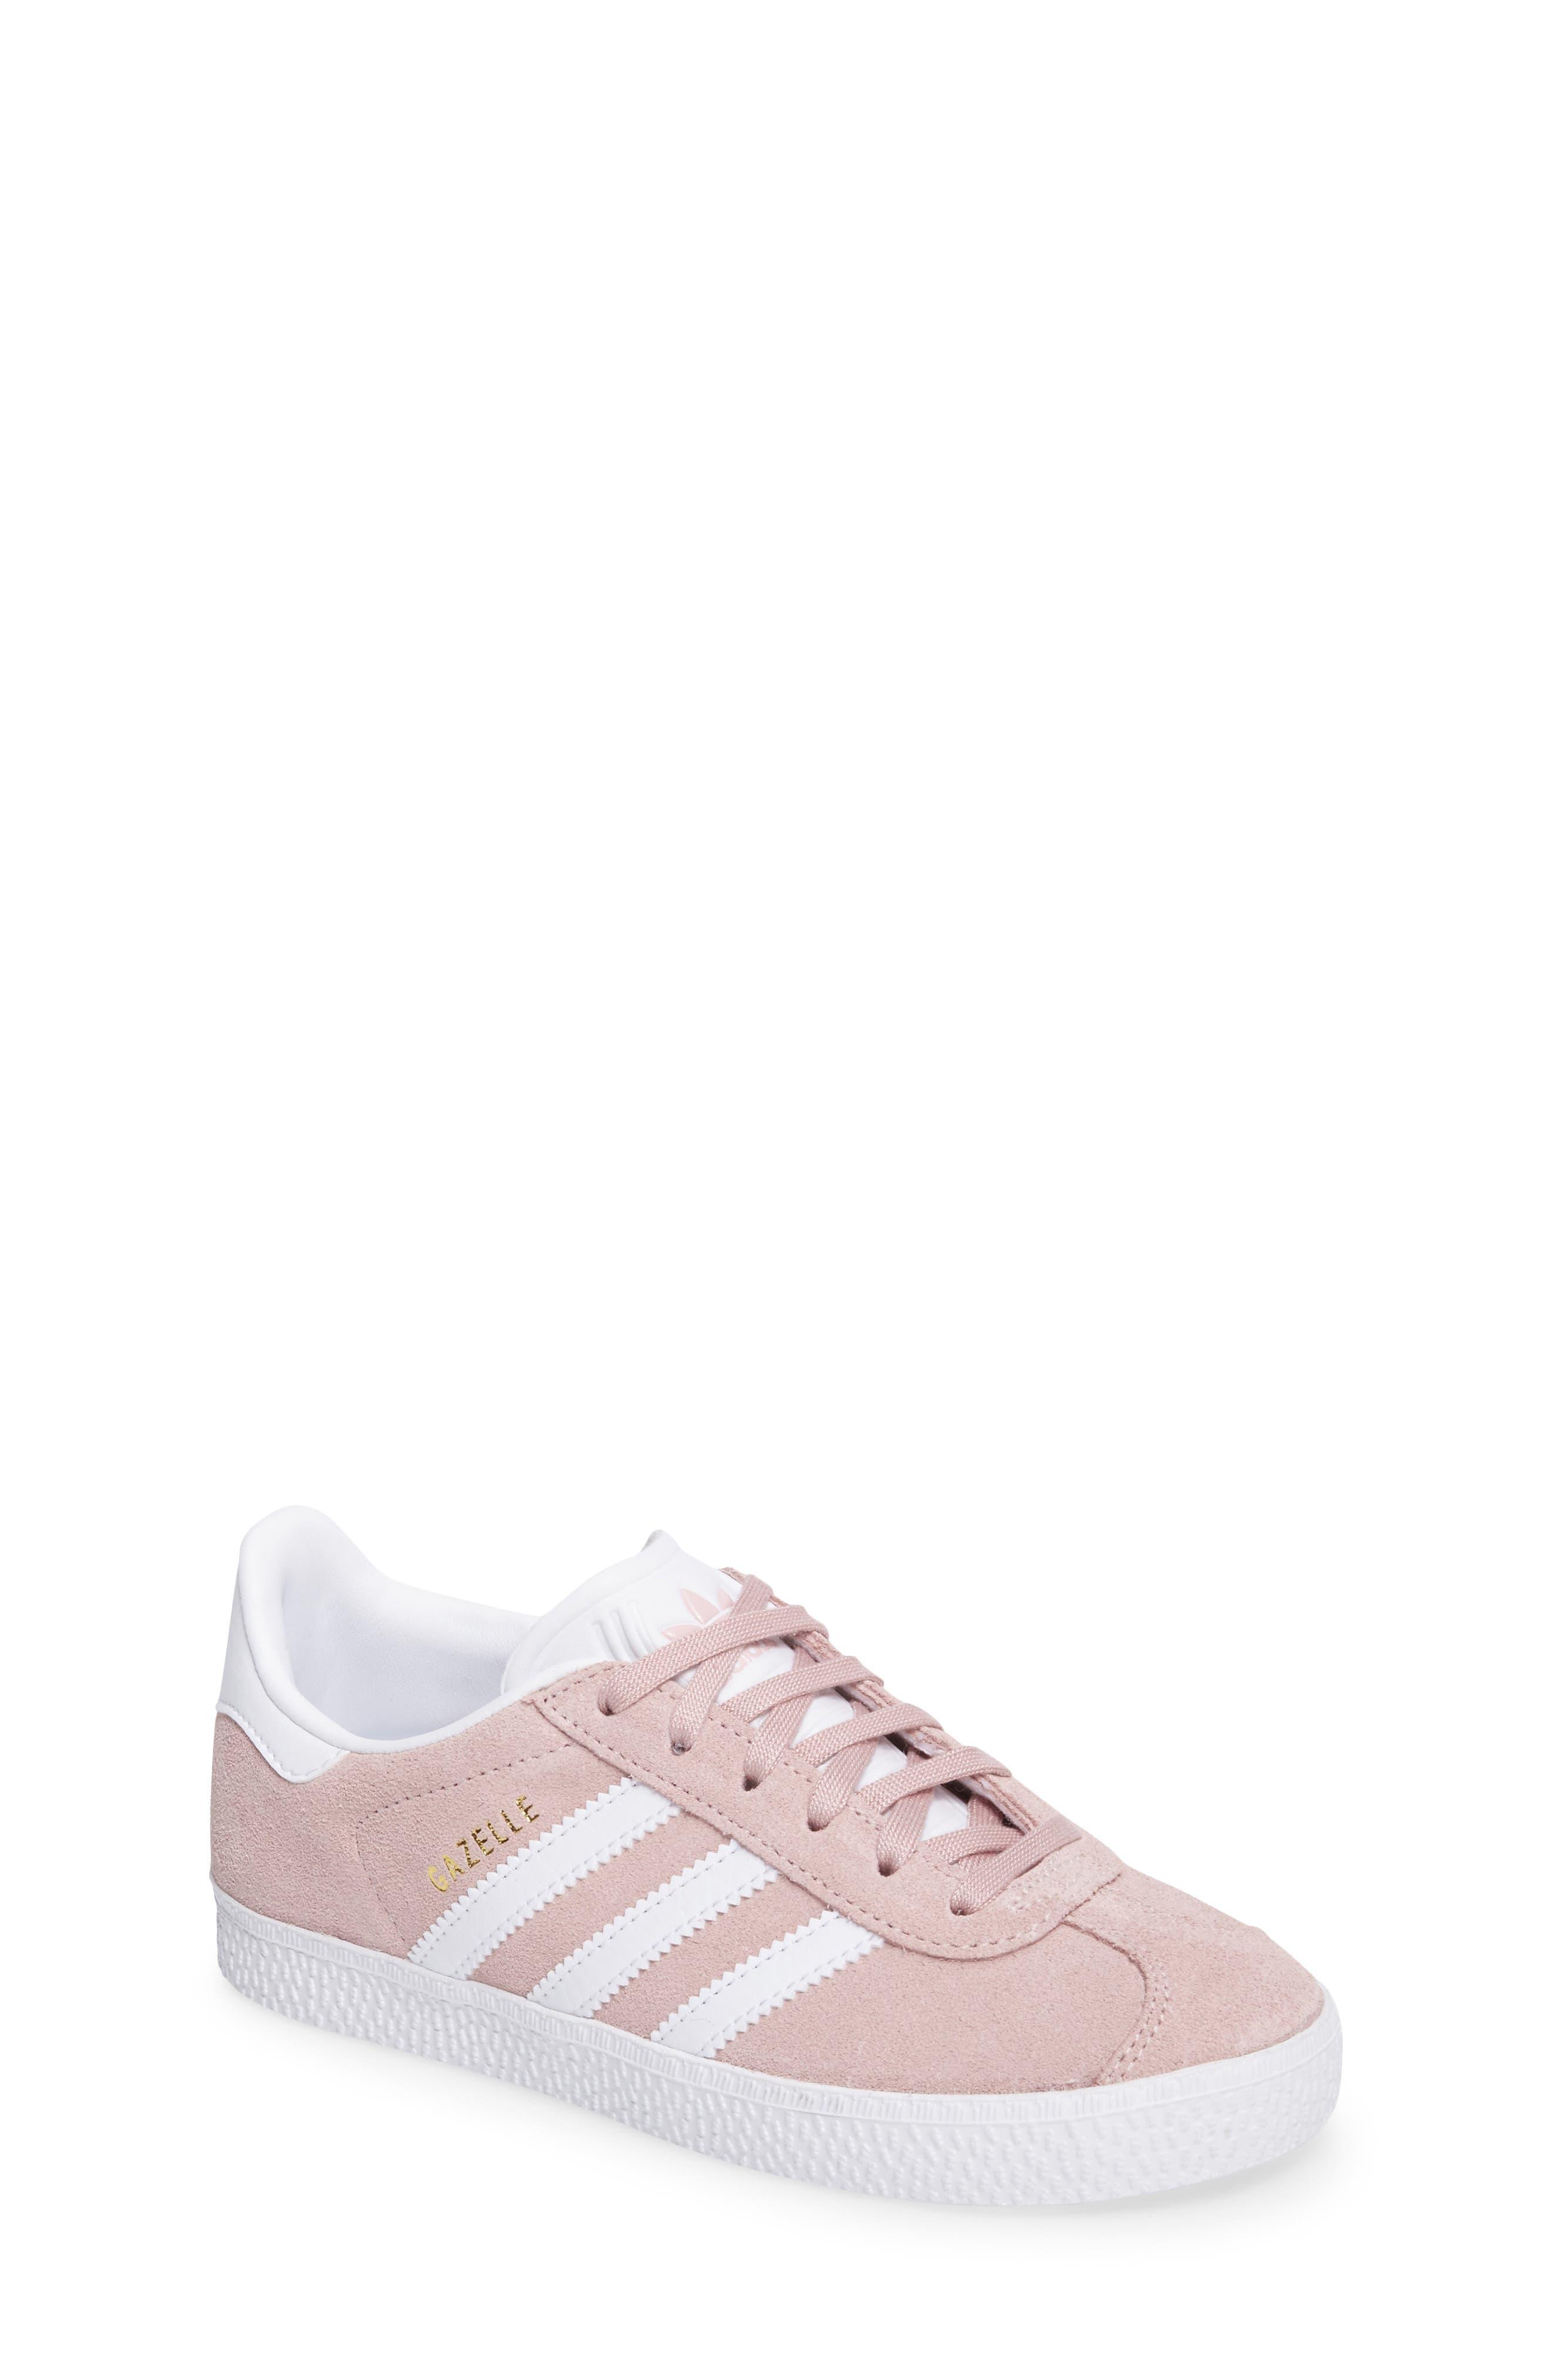 adidas | Gazelle Sneaker | Nordstrom Rack